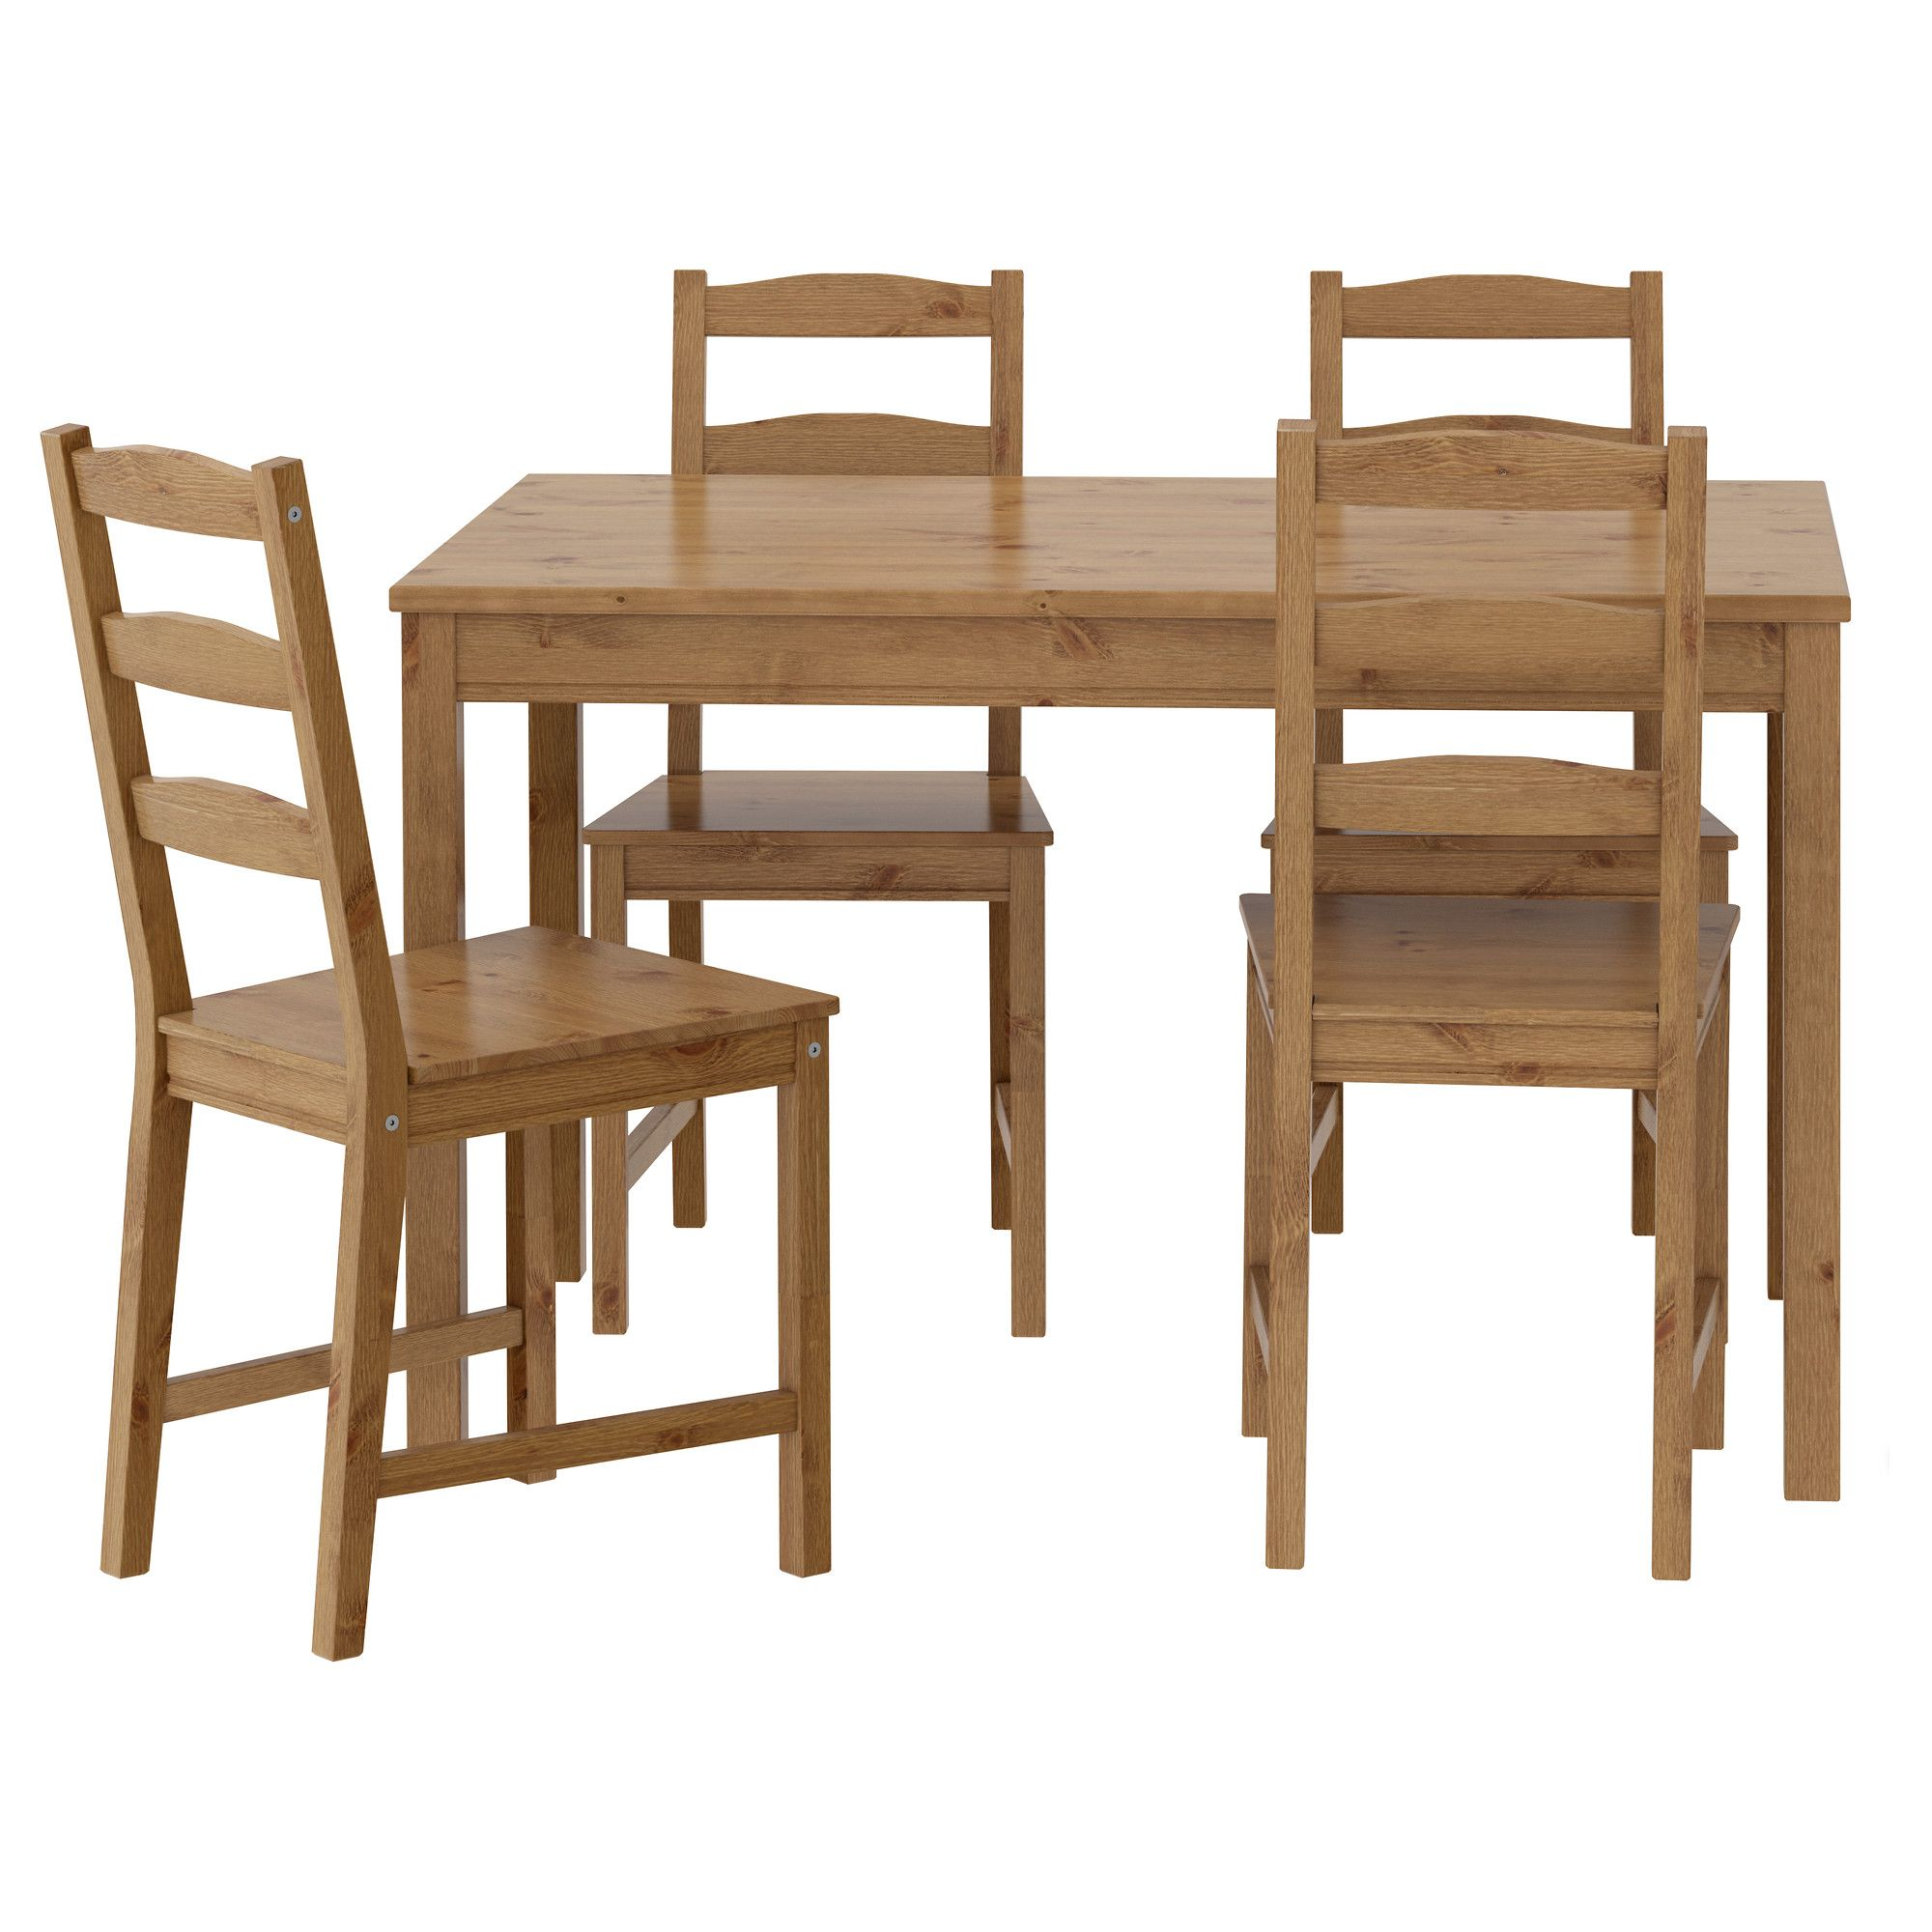 Eettafel En Stoelen Ikea.Tafel En 4 Stoelen Jokkmokk Antiekbeits Woonkamer Stoel Ikea